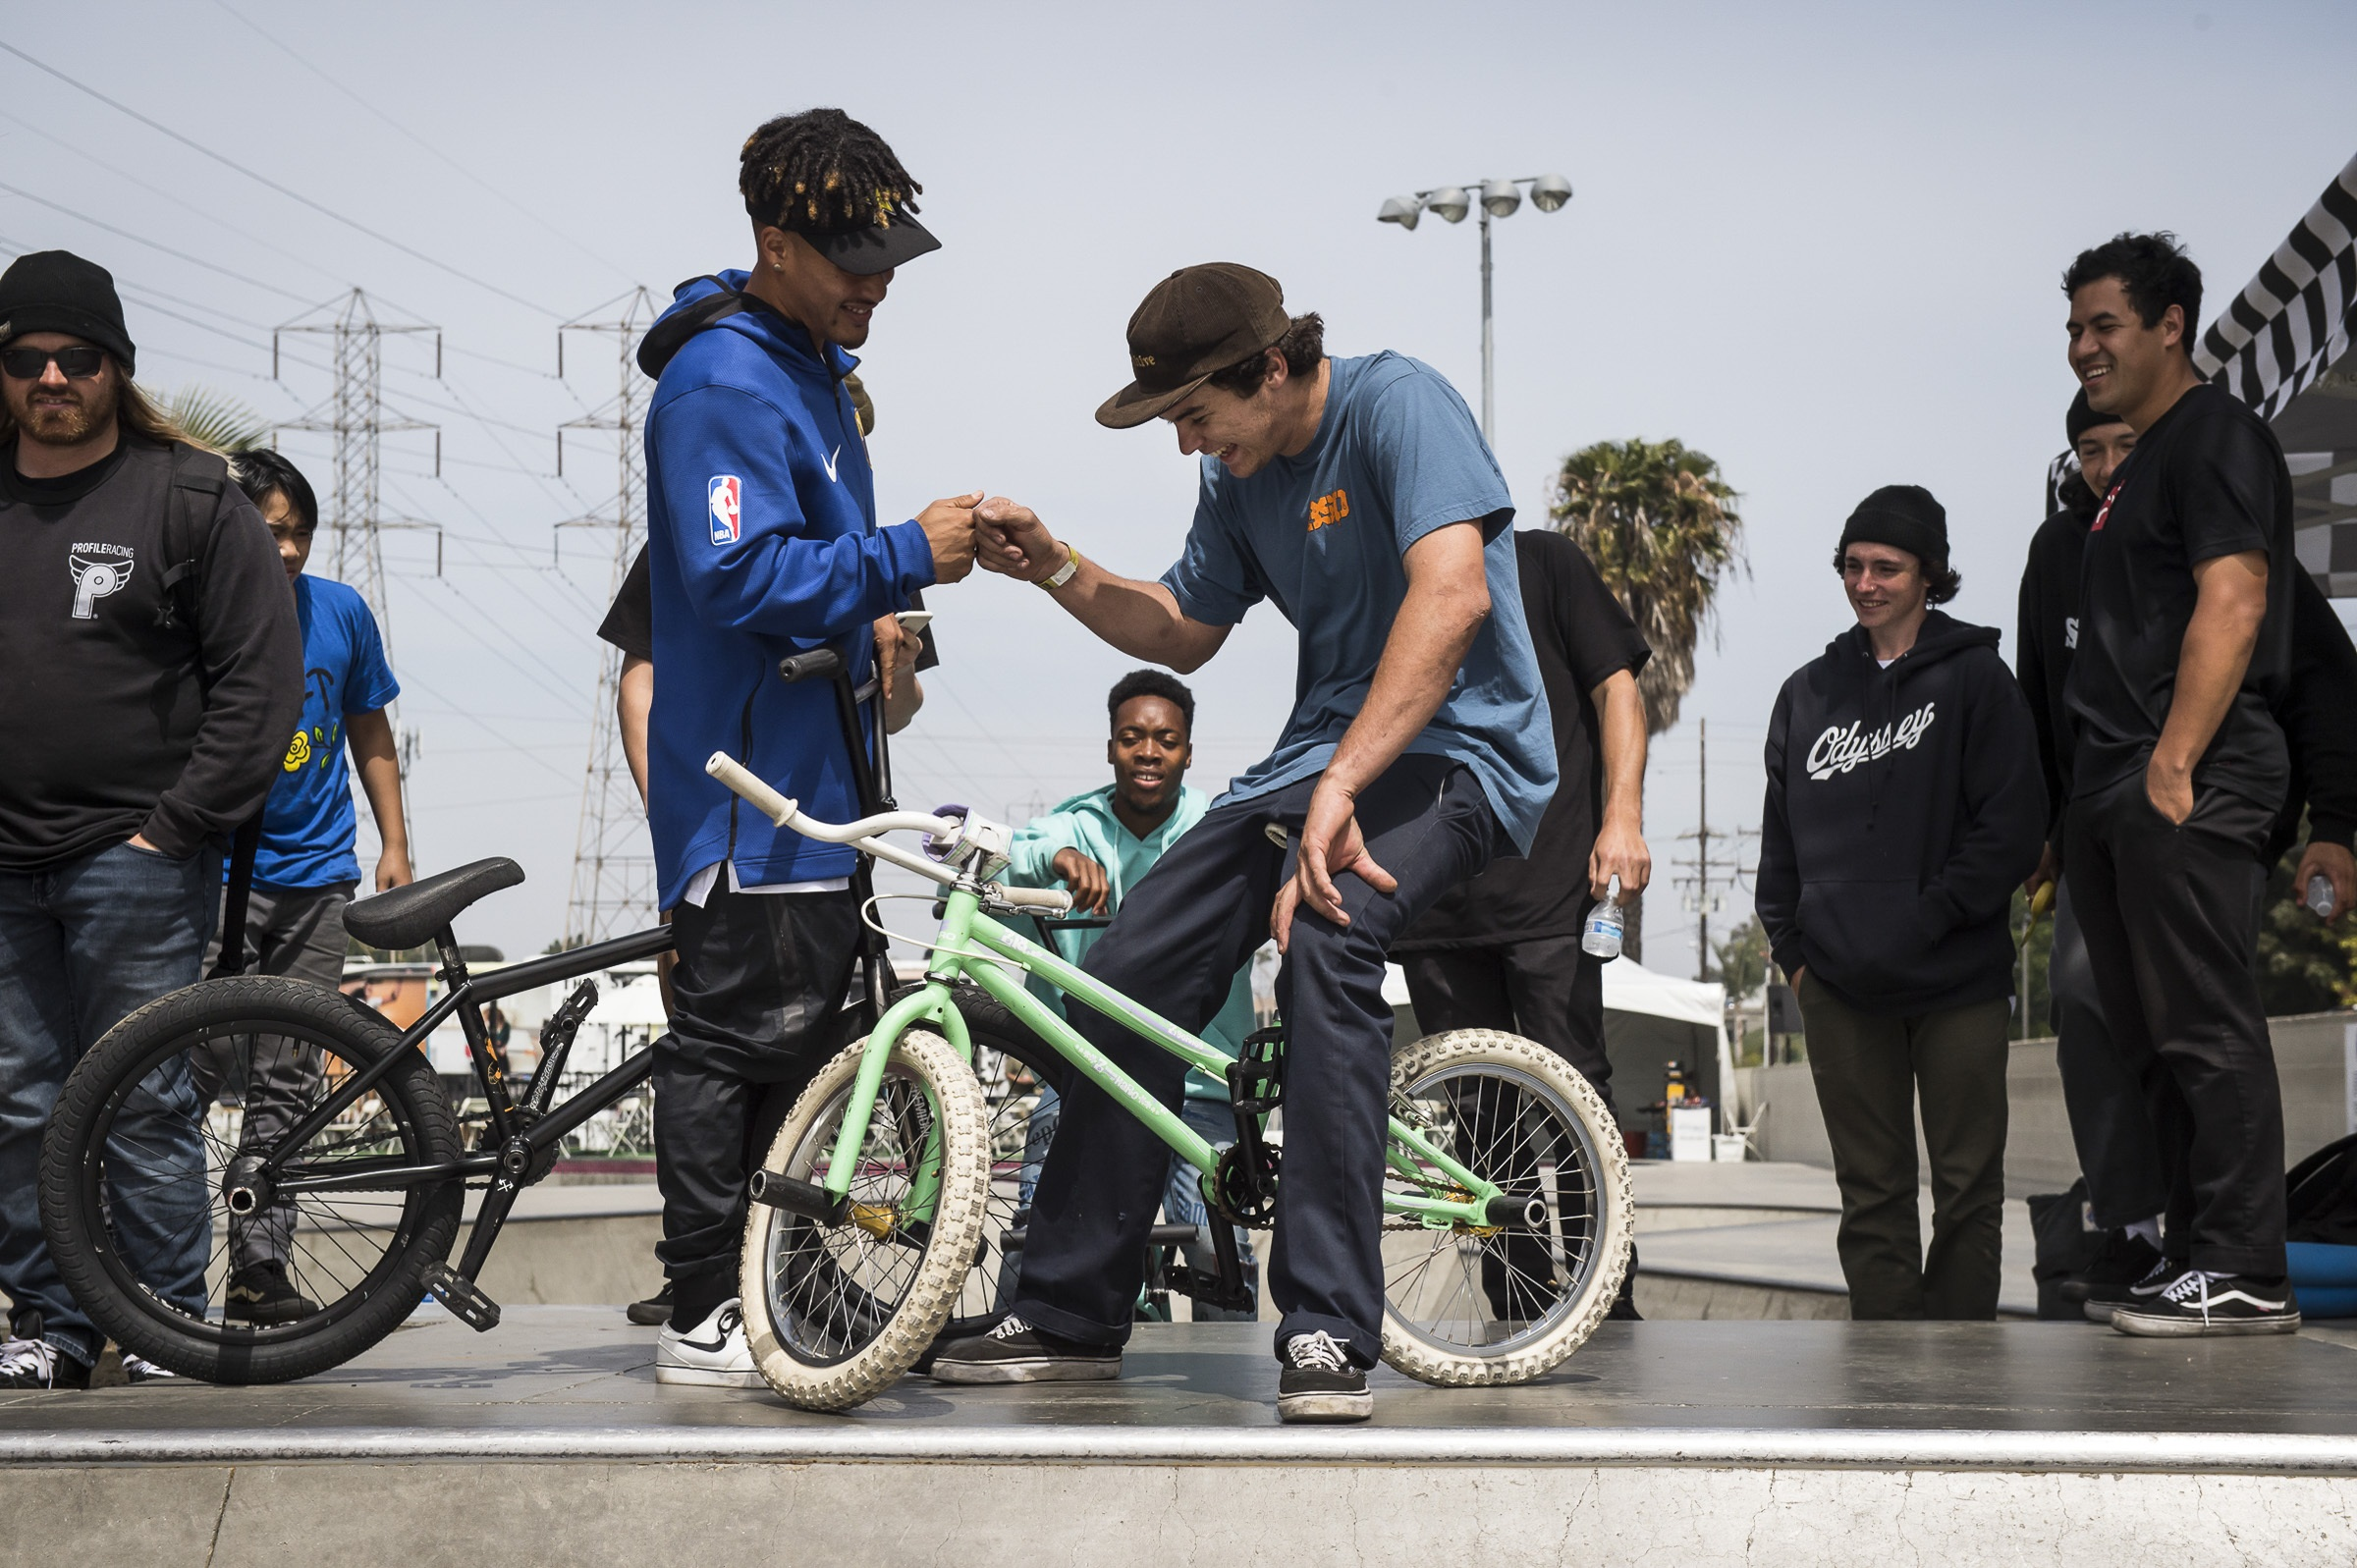 Calle principal Toro orden  Vans BMX Street Invitational In Photos - DIG BMX